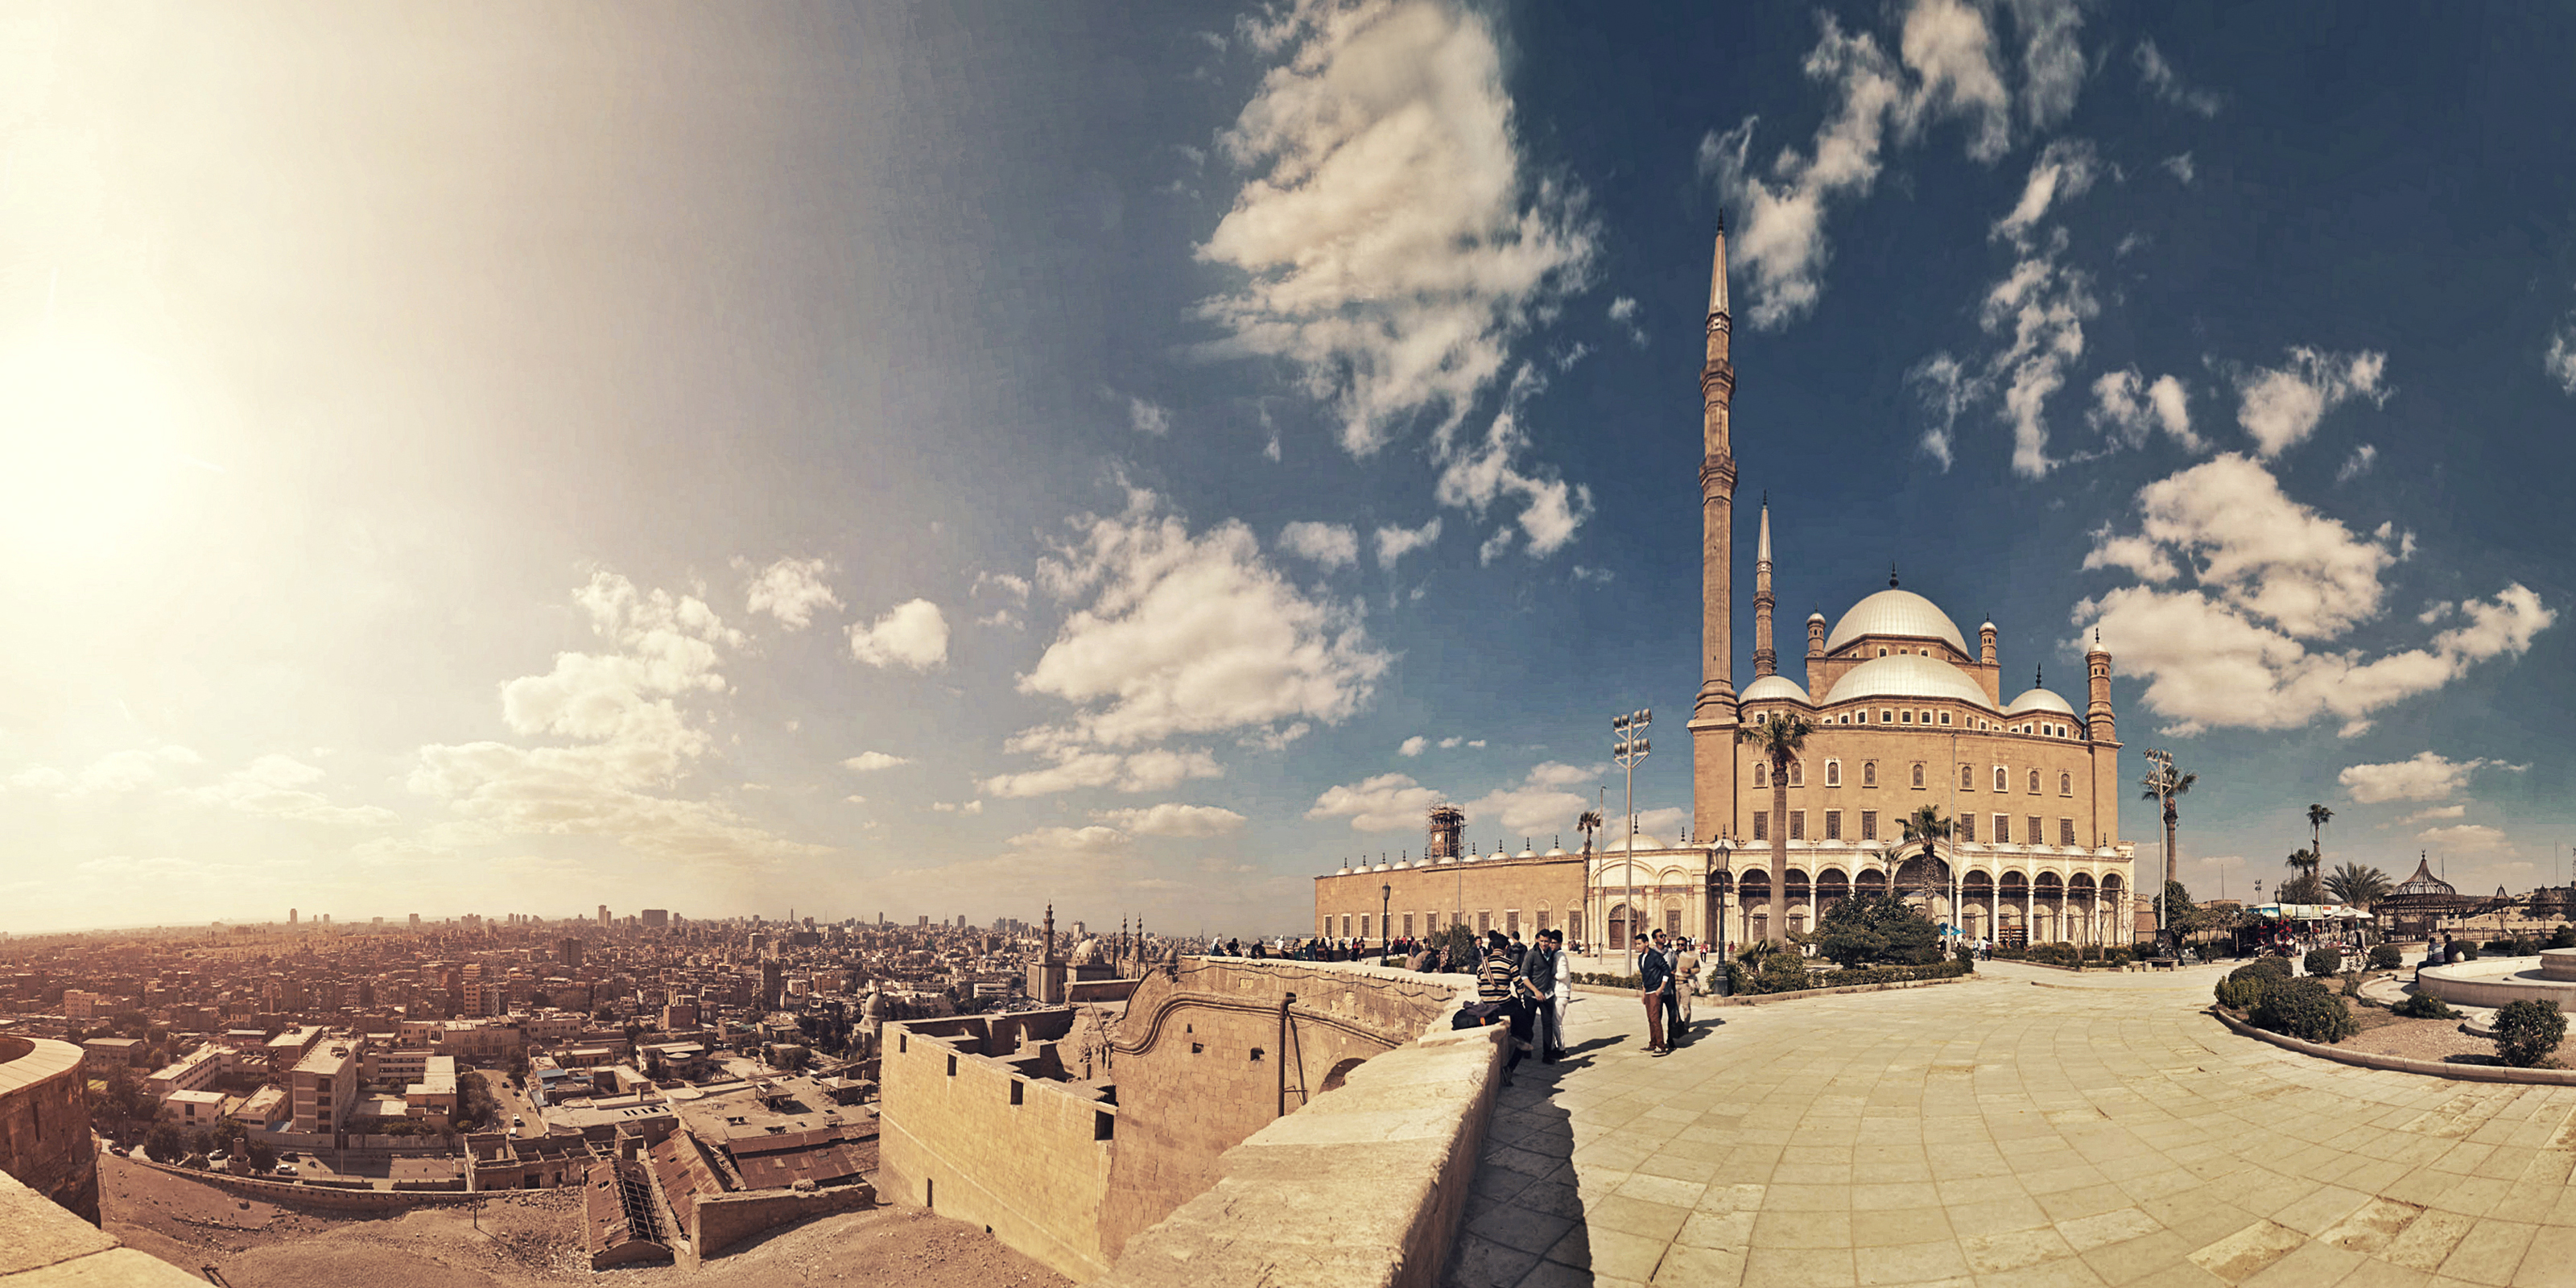 Filemohamed Ali Mosque And Cairo Panorama Viewjpg